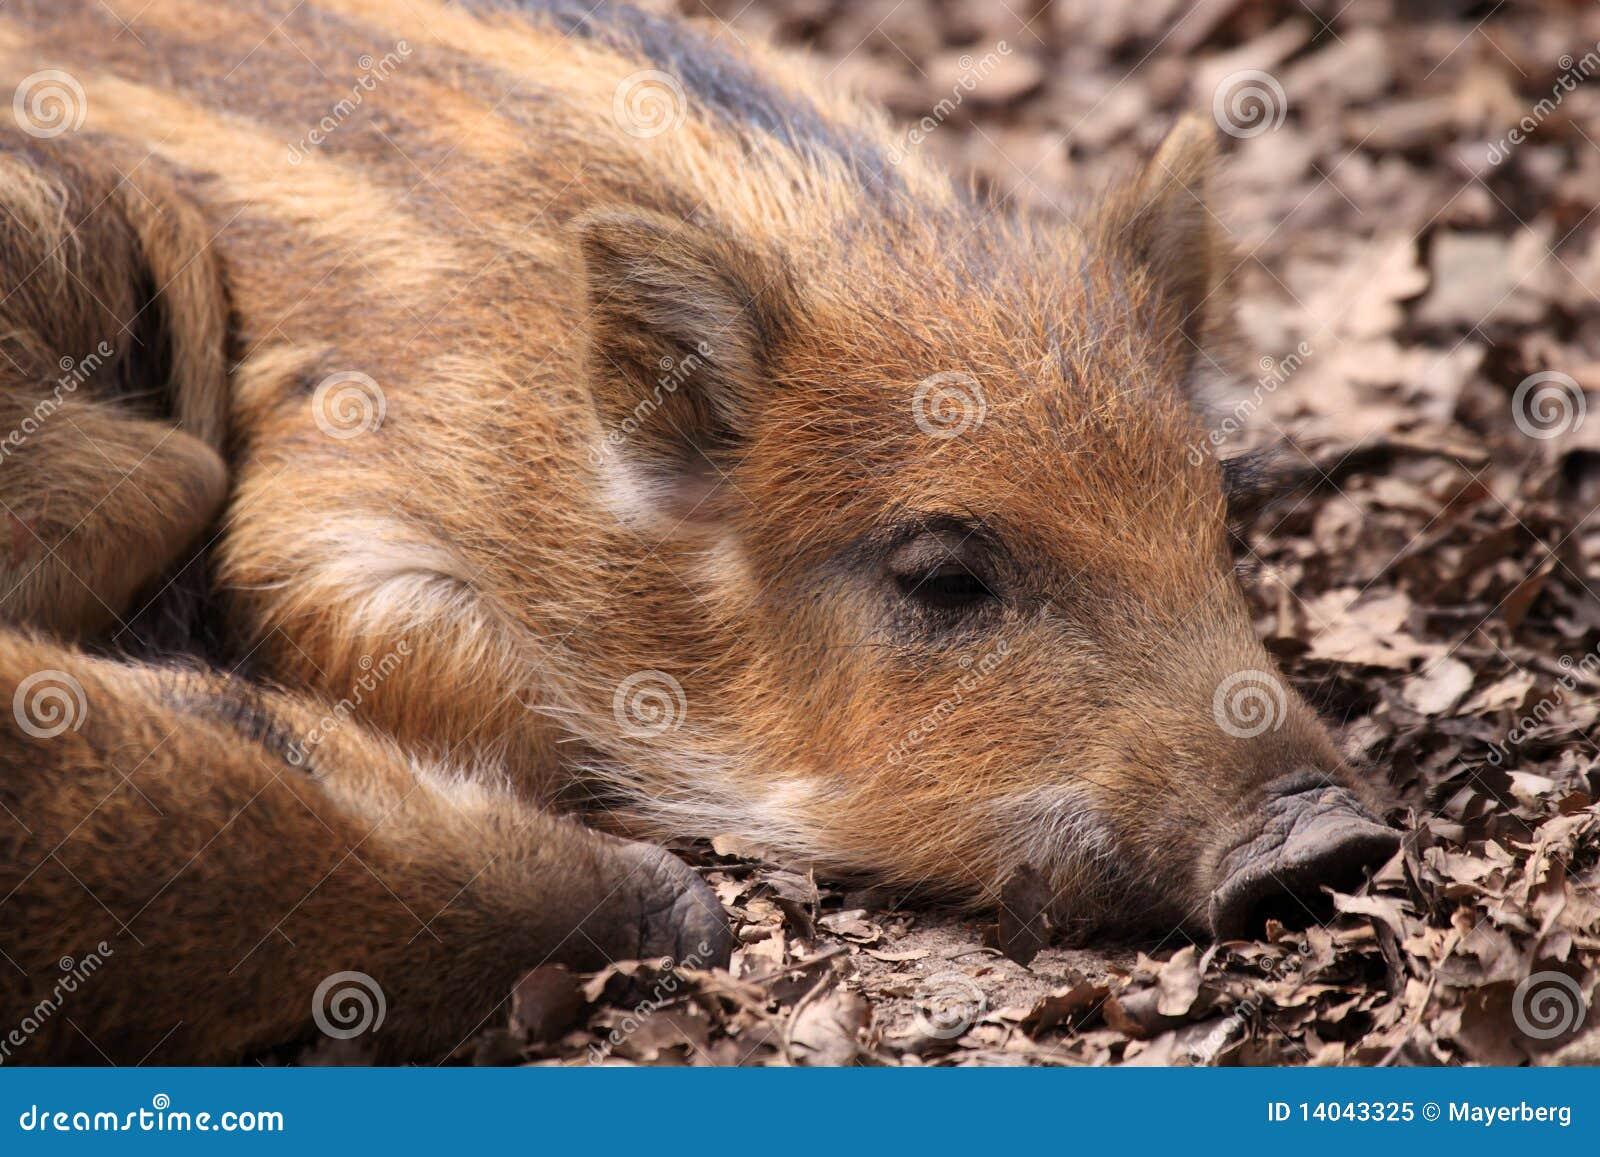 The Boar Or Wild Boar (Sus Scrofa) Stock Image - Image of